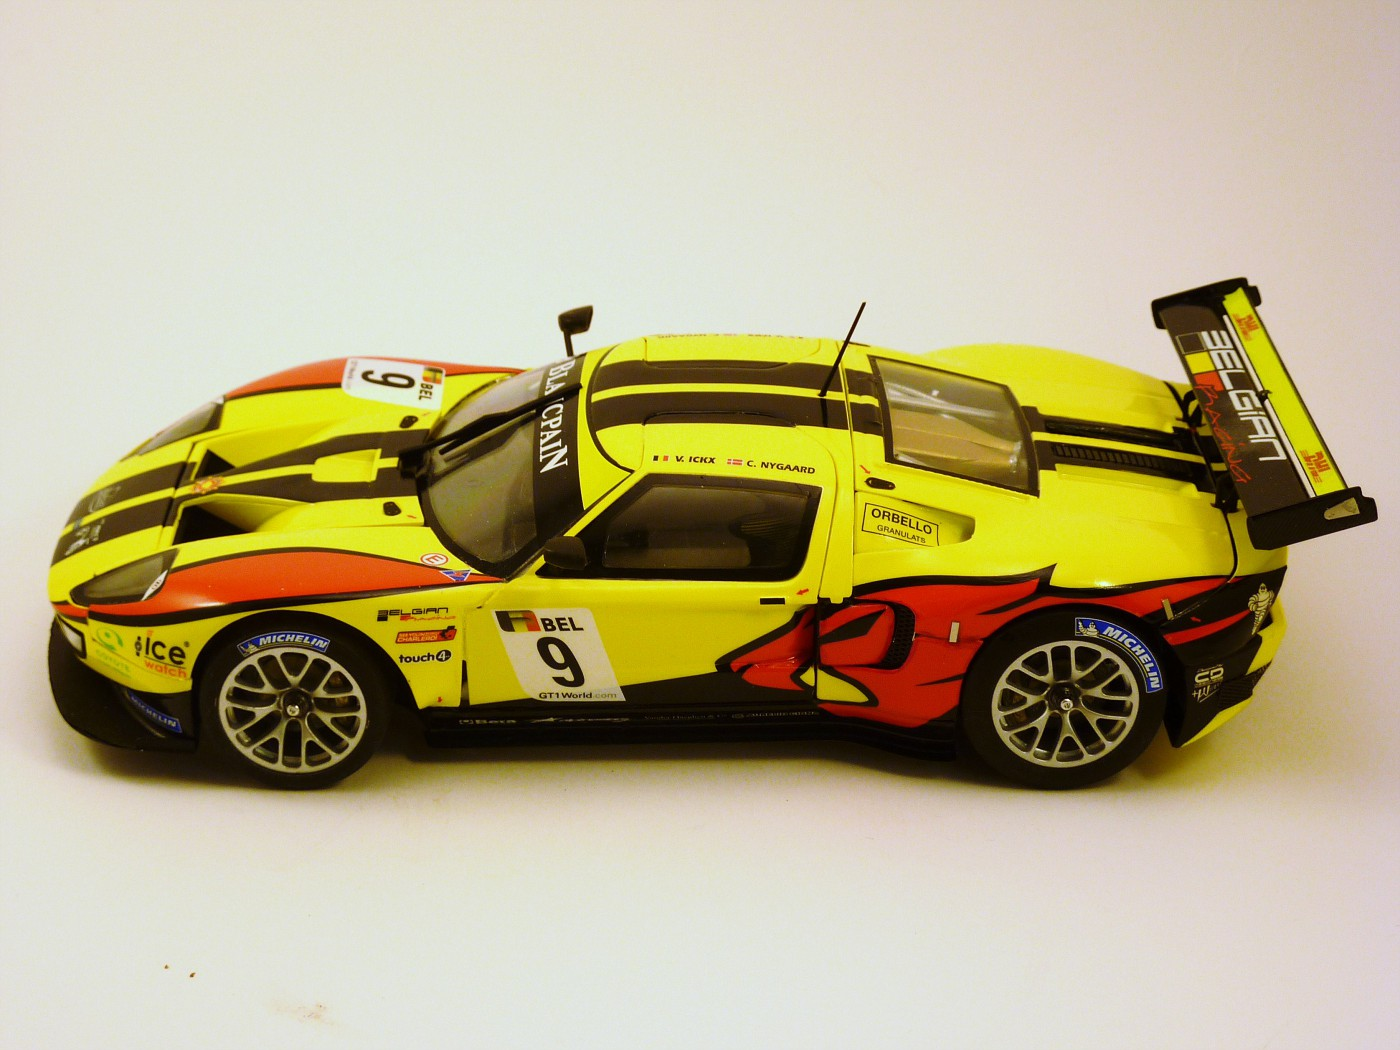 Ford gt1 Belgian racing FinalesFordGt1BelgianRacing003-vi